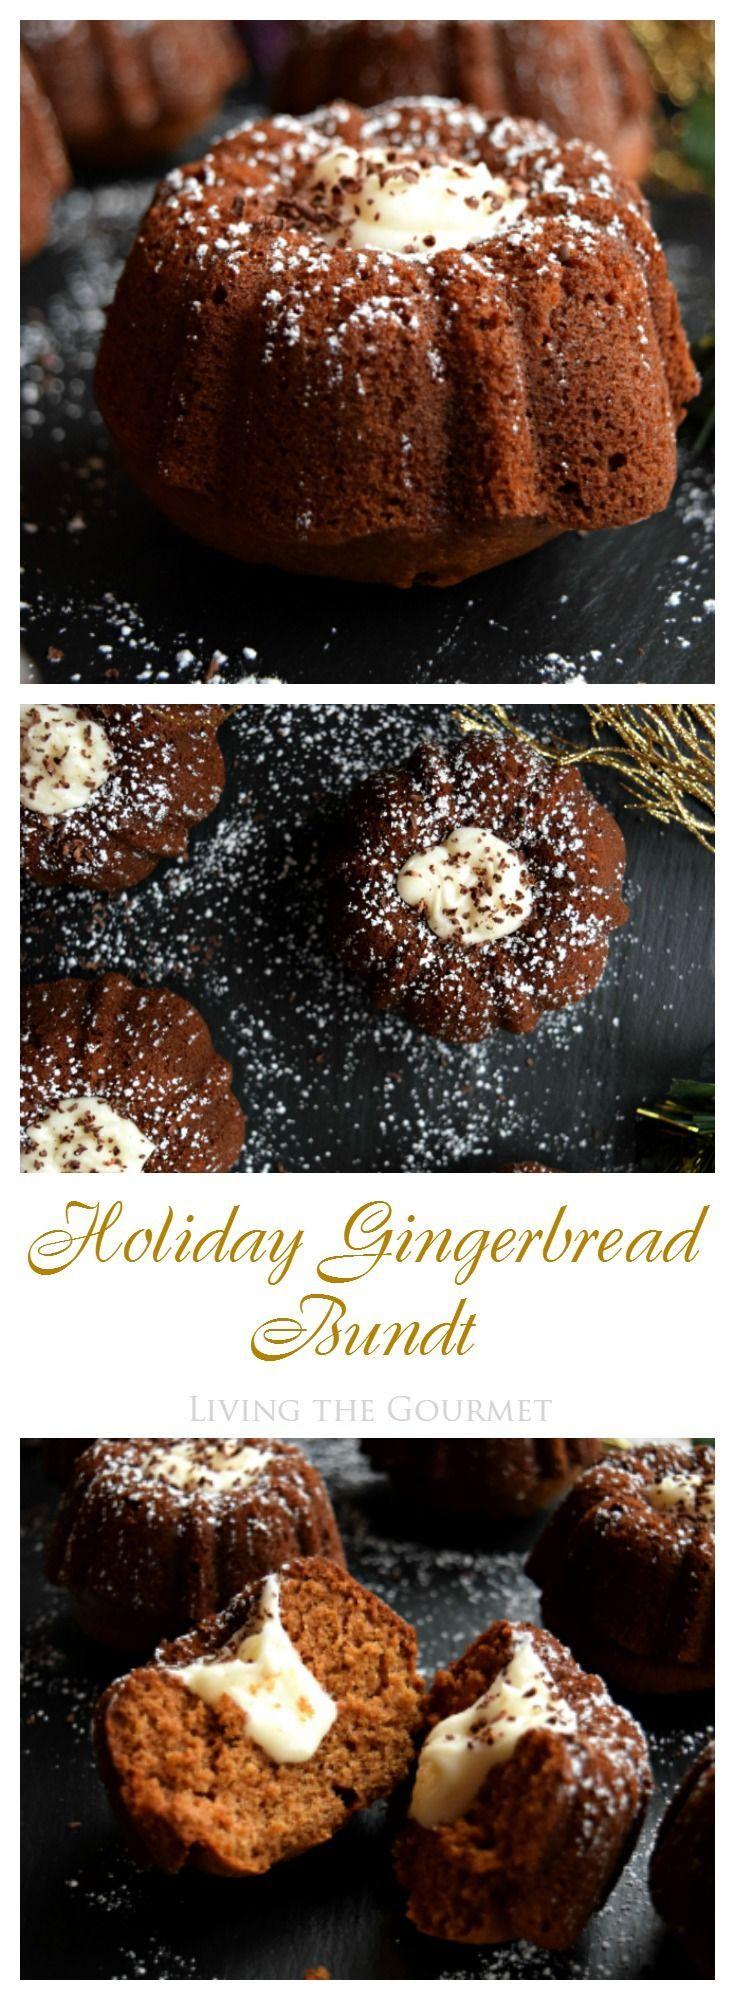 Living the Gourmet: Holiday Gingerbread Bundt | #BundtBakers